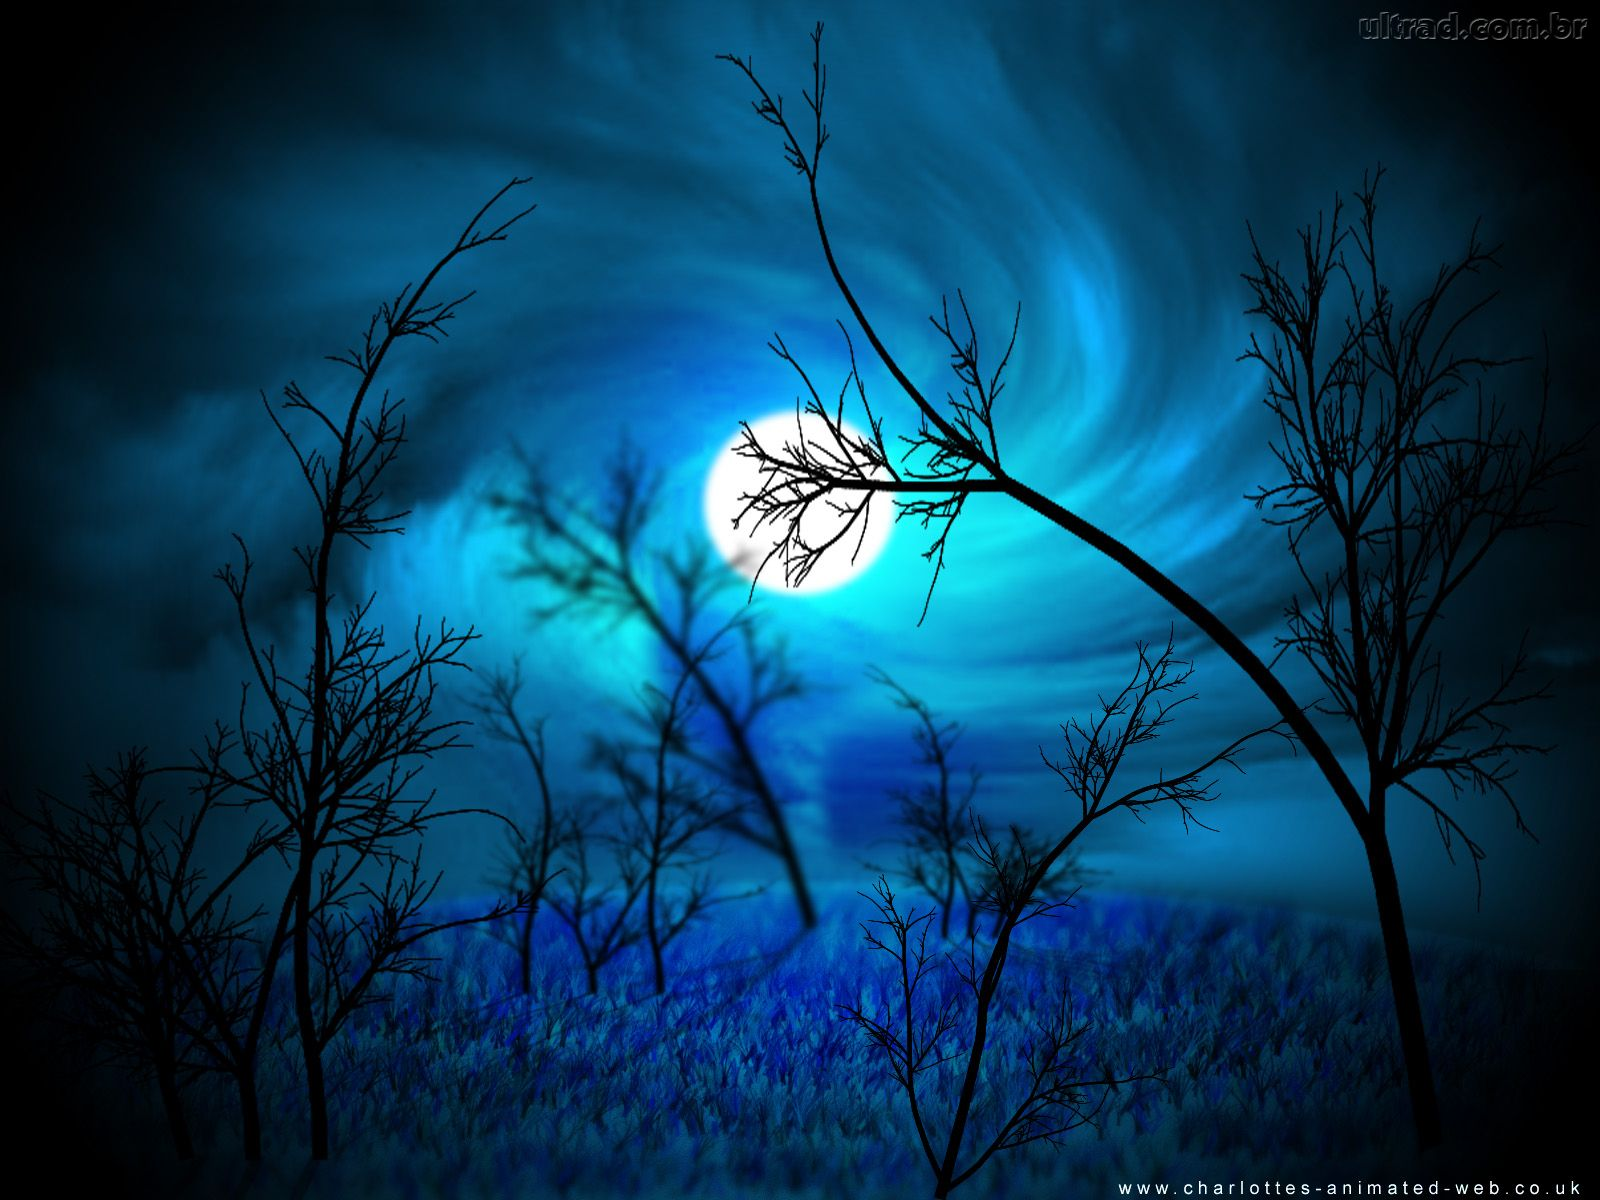 Lady midnight wallpaper wallpapersafari - Midnight wallpaper hd ...